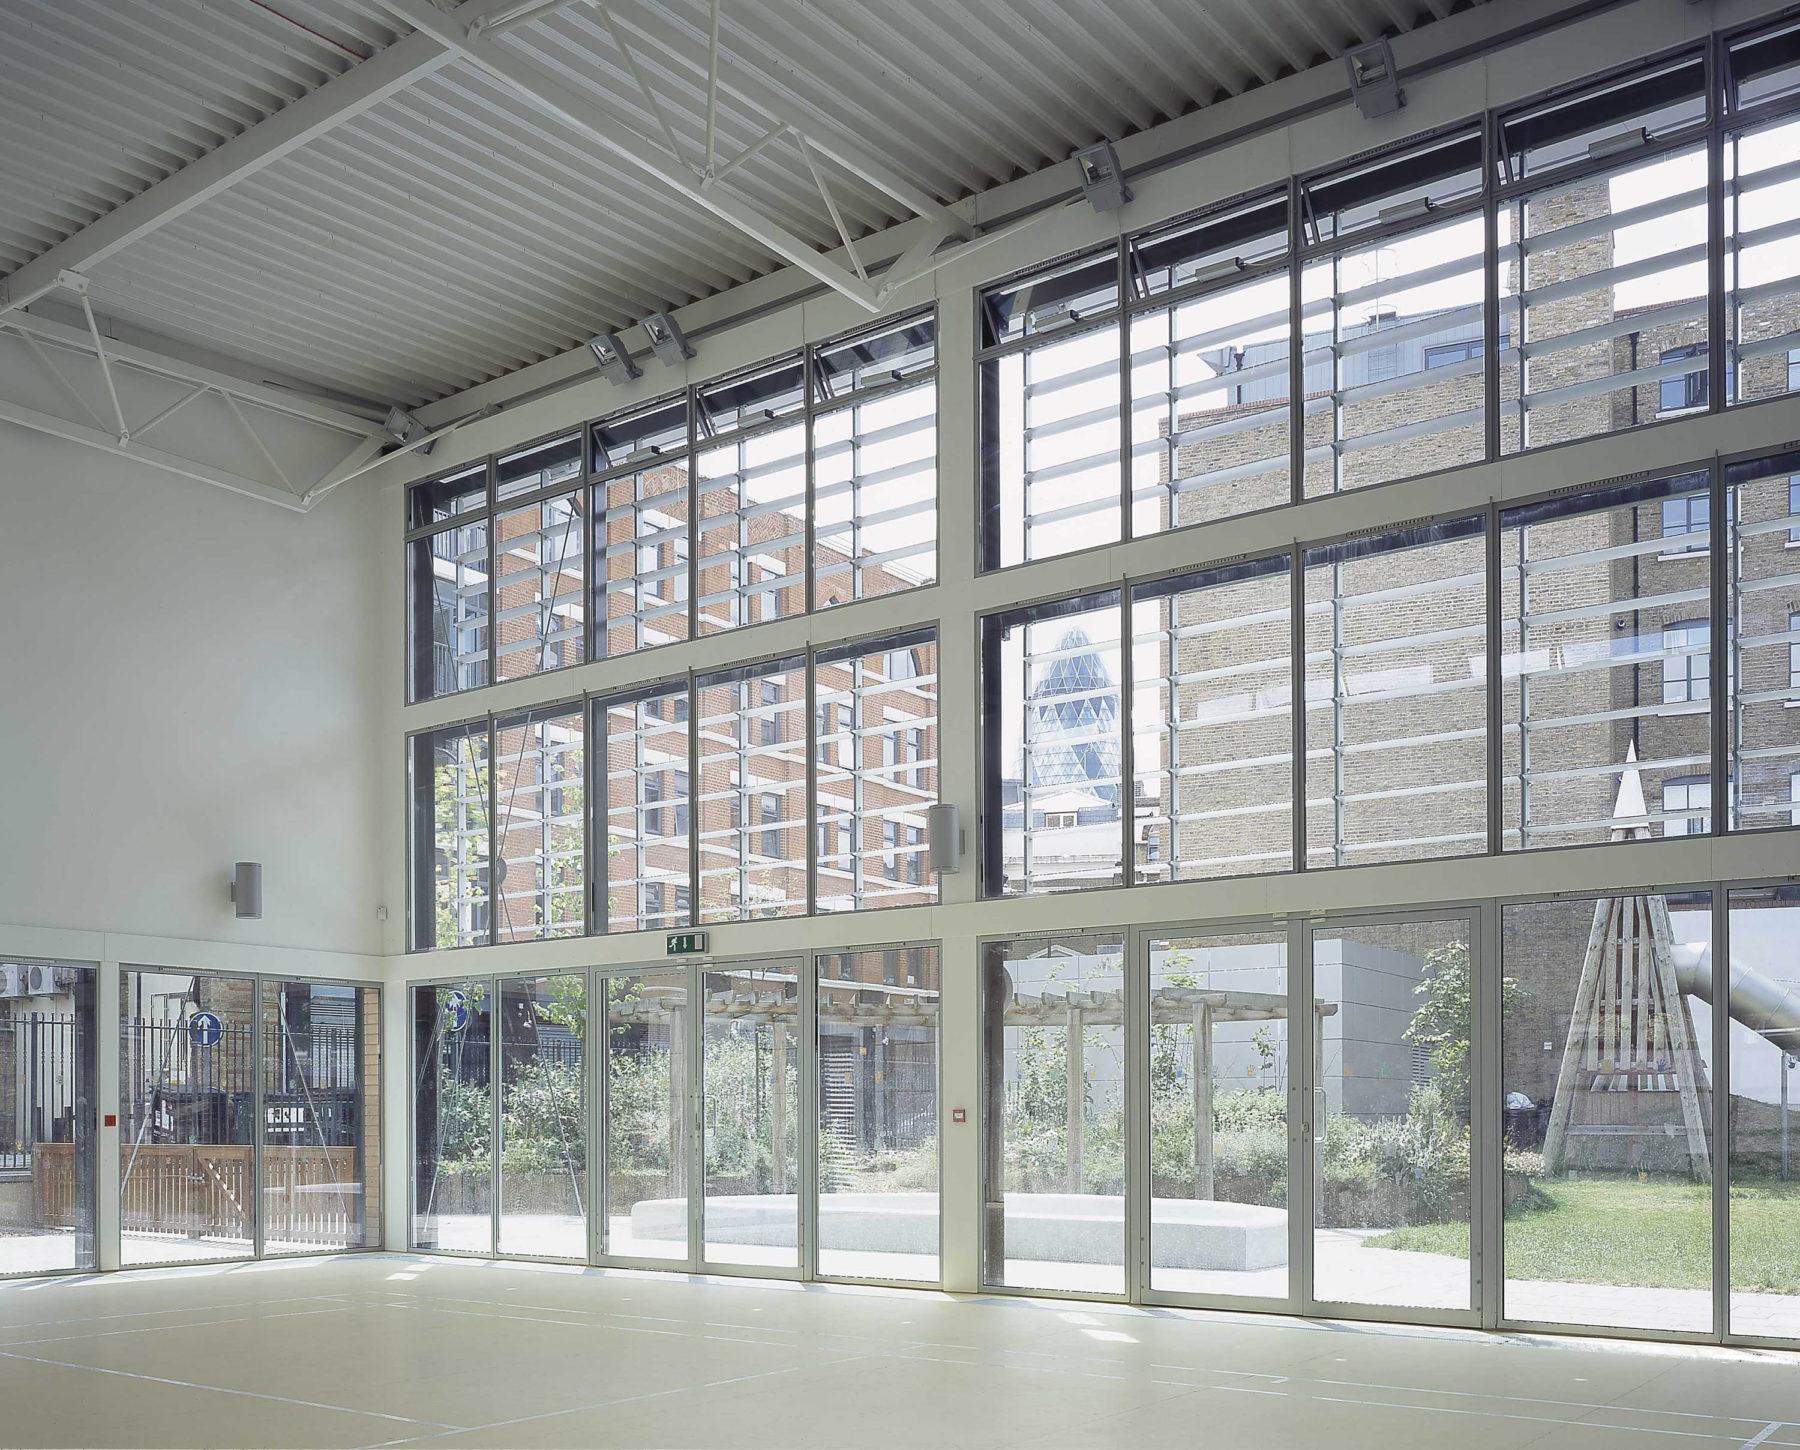 Attlee Community Centre 06 Internal Hall